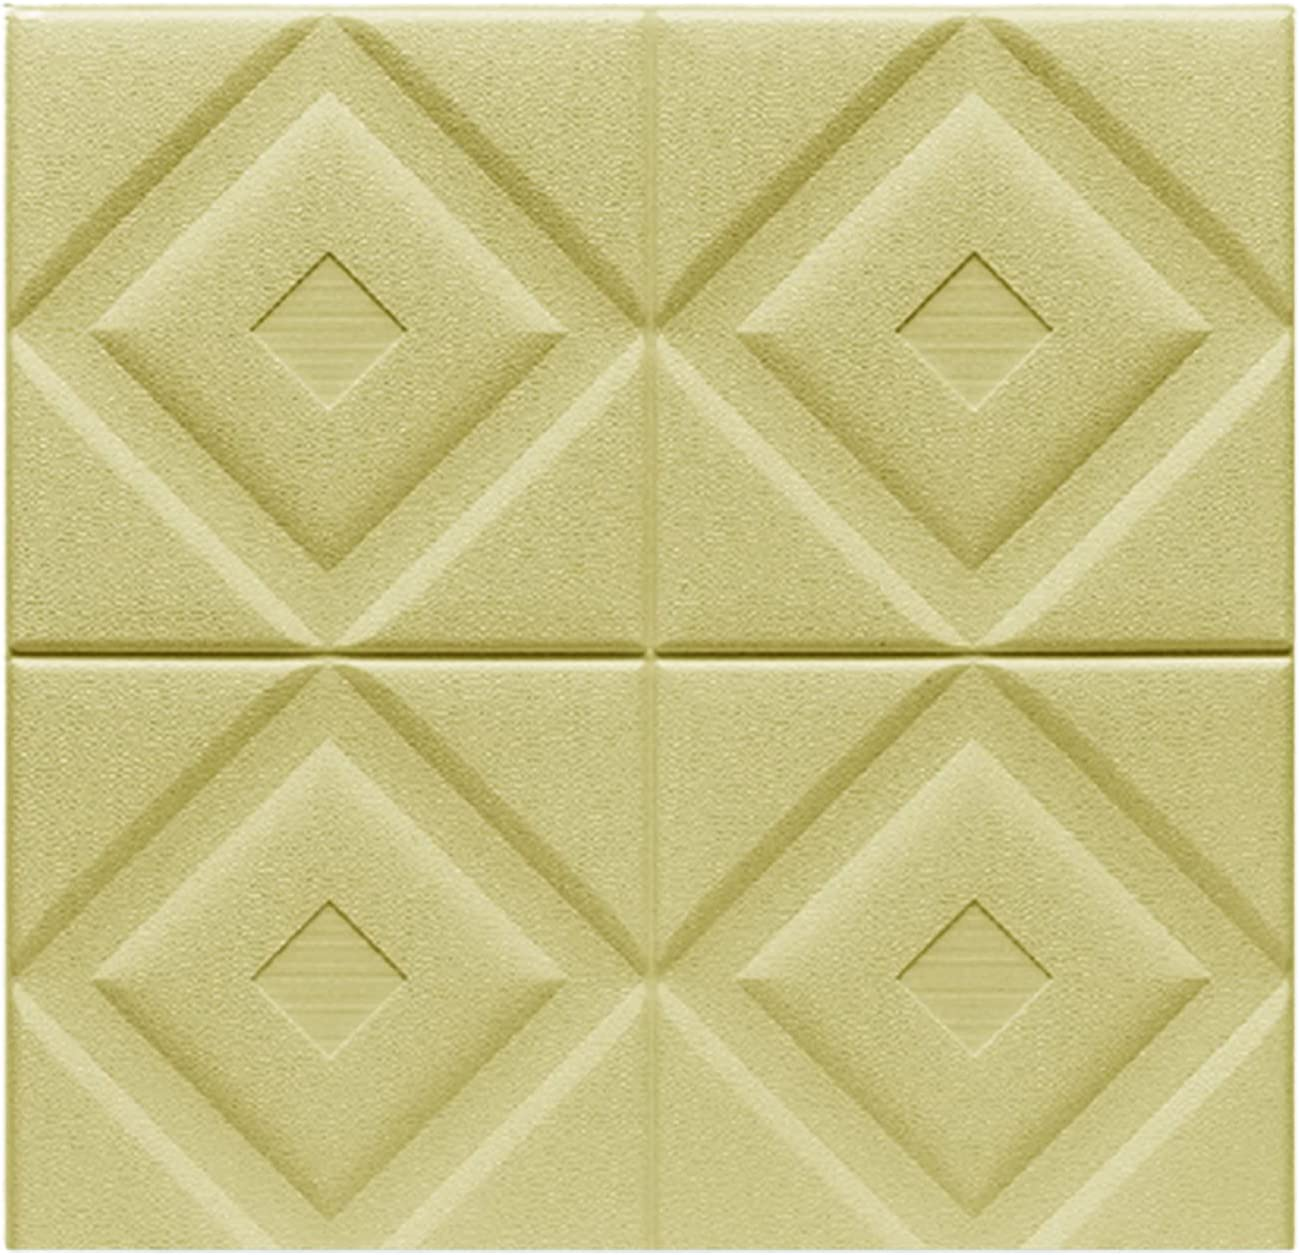 AIMIMI 3D Luxury goods Wall Panels Foam Brick Stick Wallpap Sales results No. 1 Peel and Packs 10